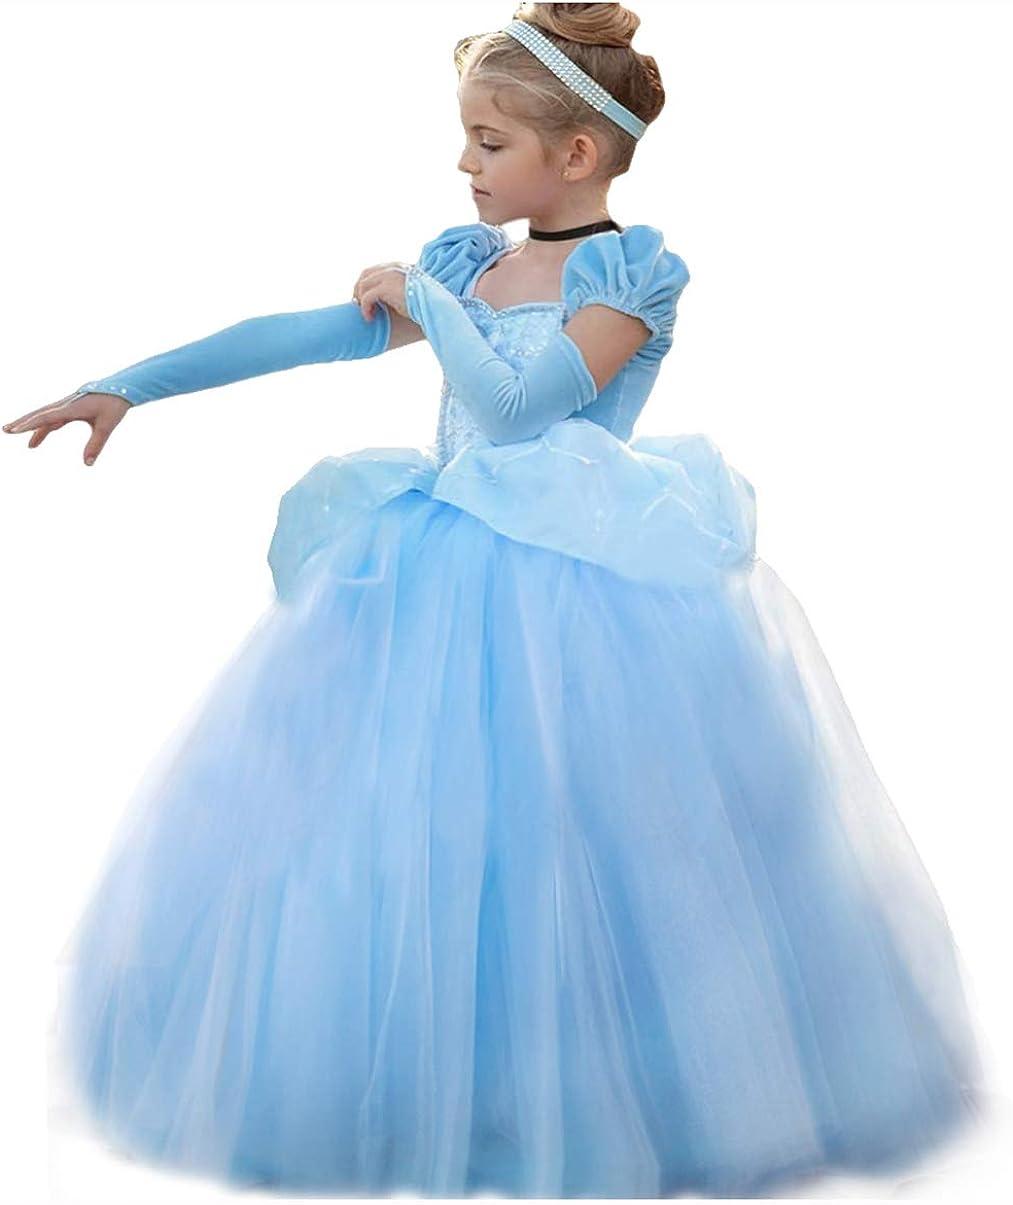 Kids Girl Cinderella Costume Princess Dress Halloween Cosplay dress Xmas Gift